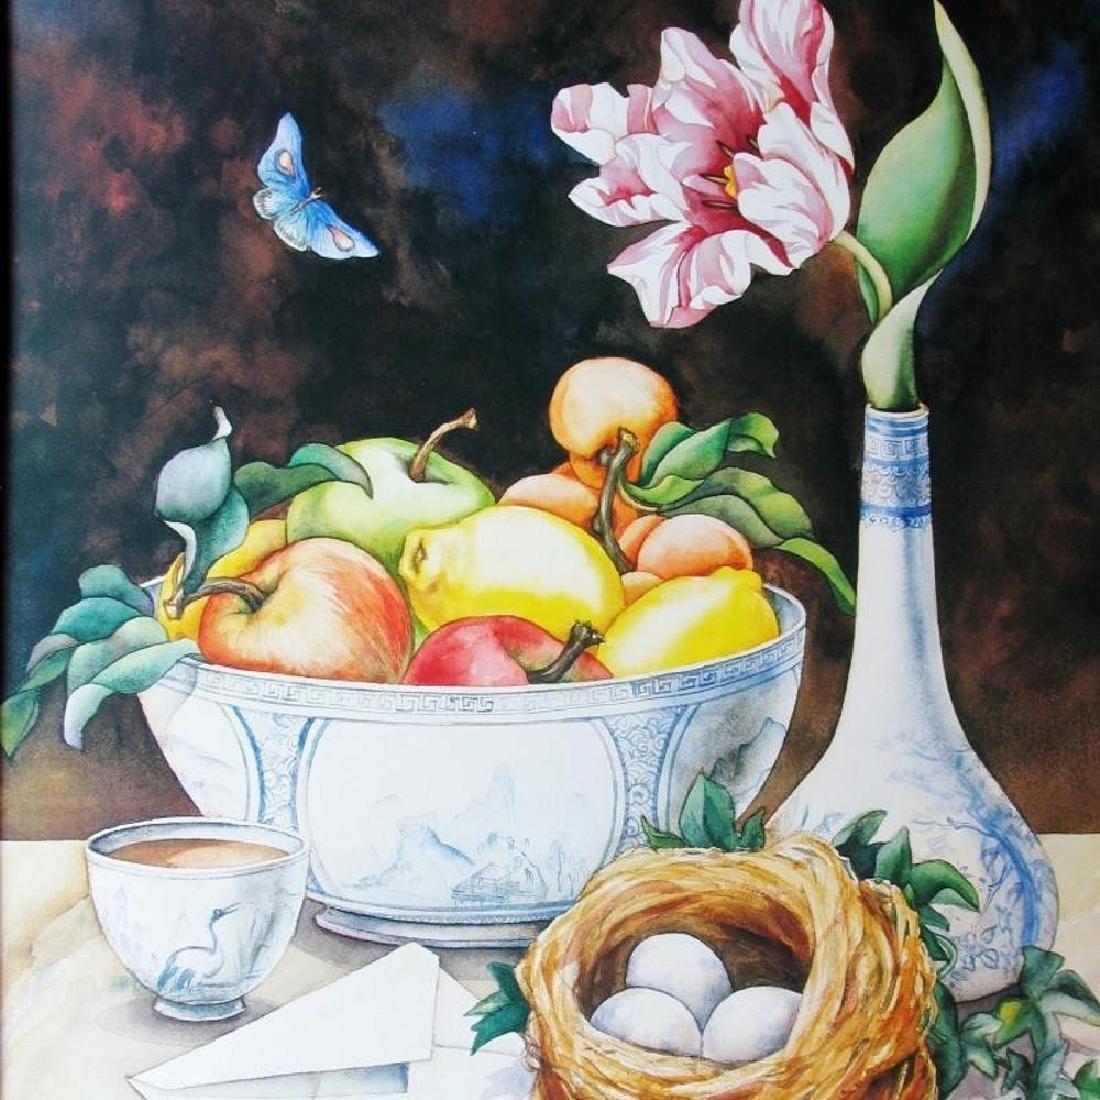 Yuriko Takata 1992 Four Seasons Colorful Print - 3